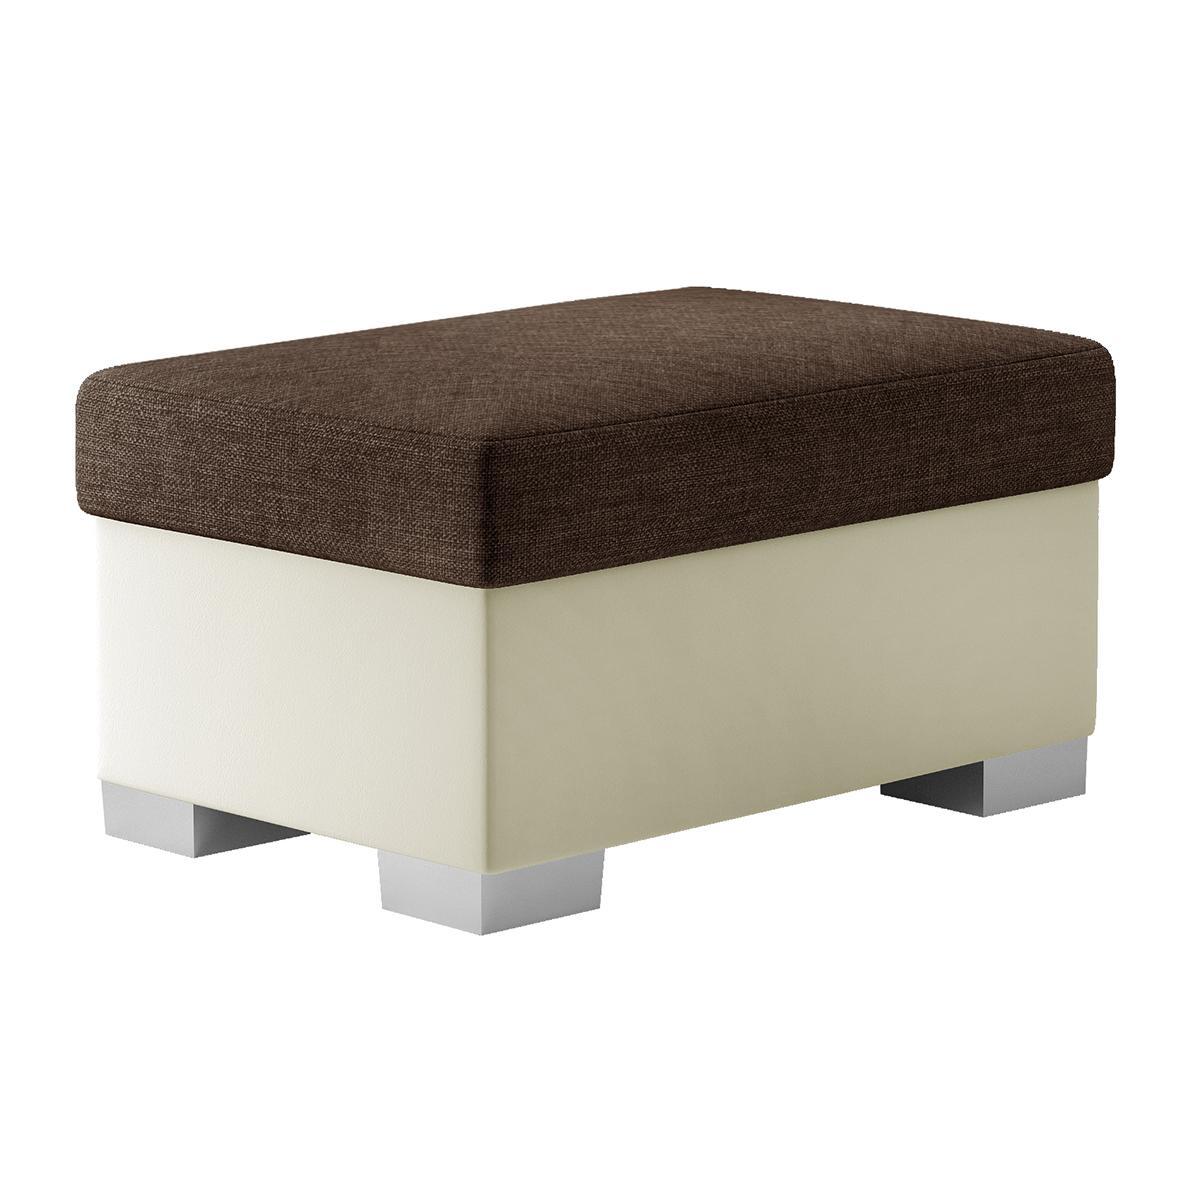 NABBI T4 taburetka hnedá / béžová